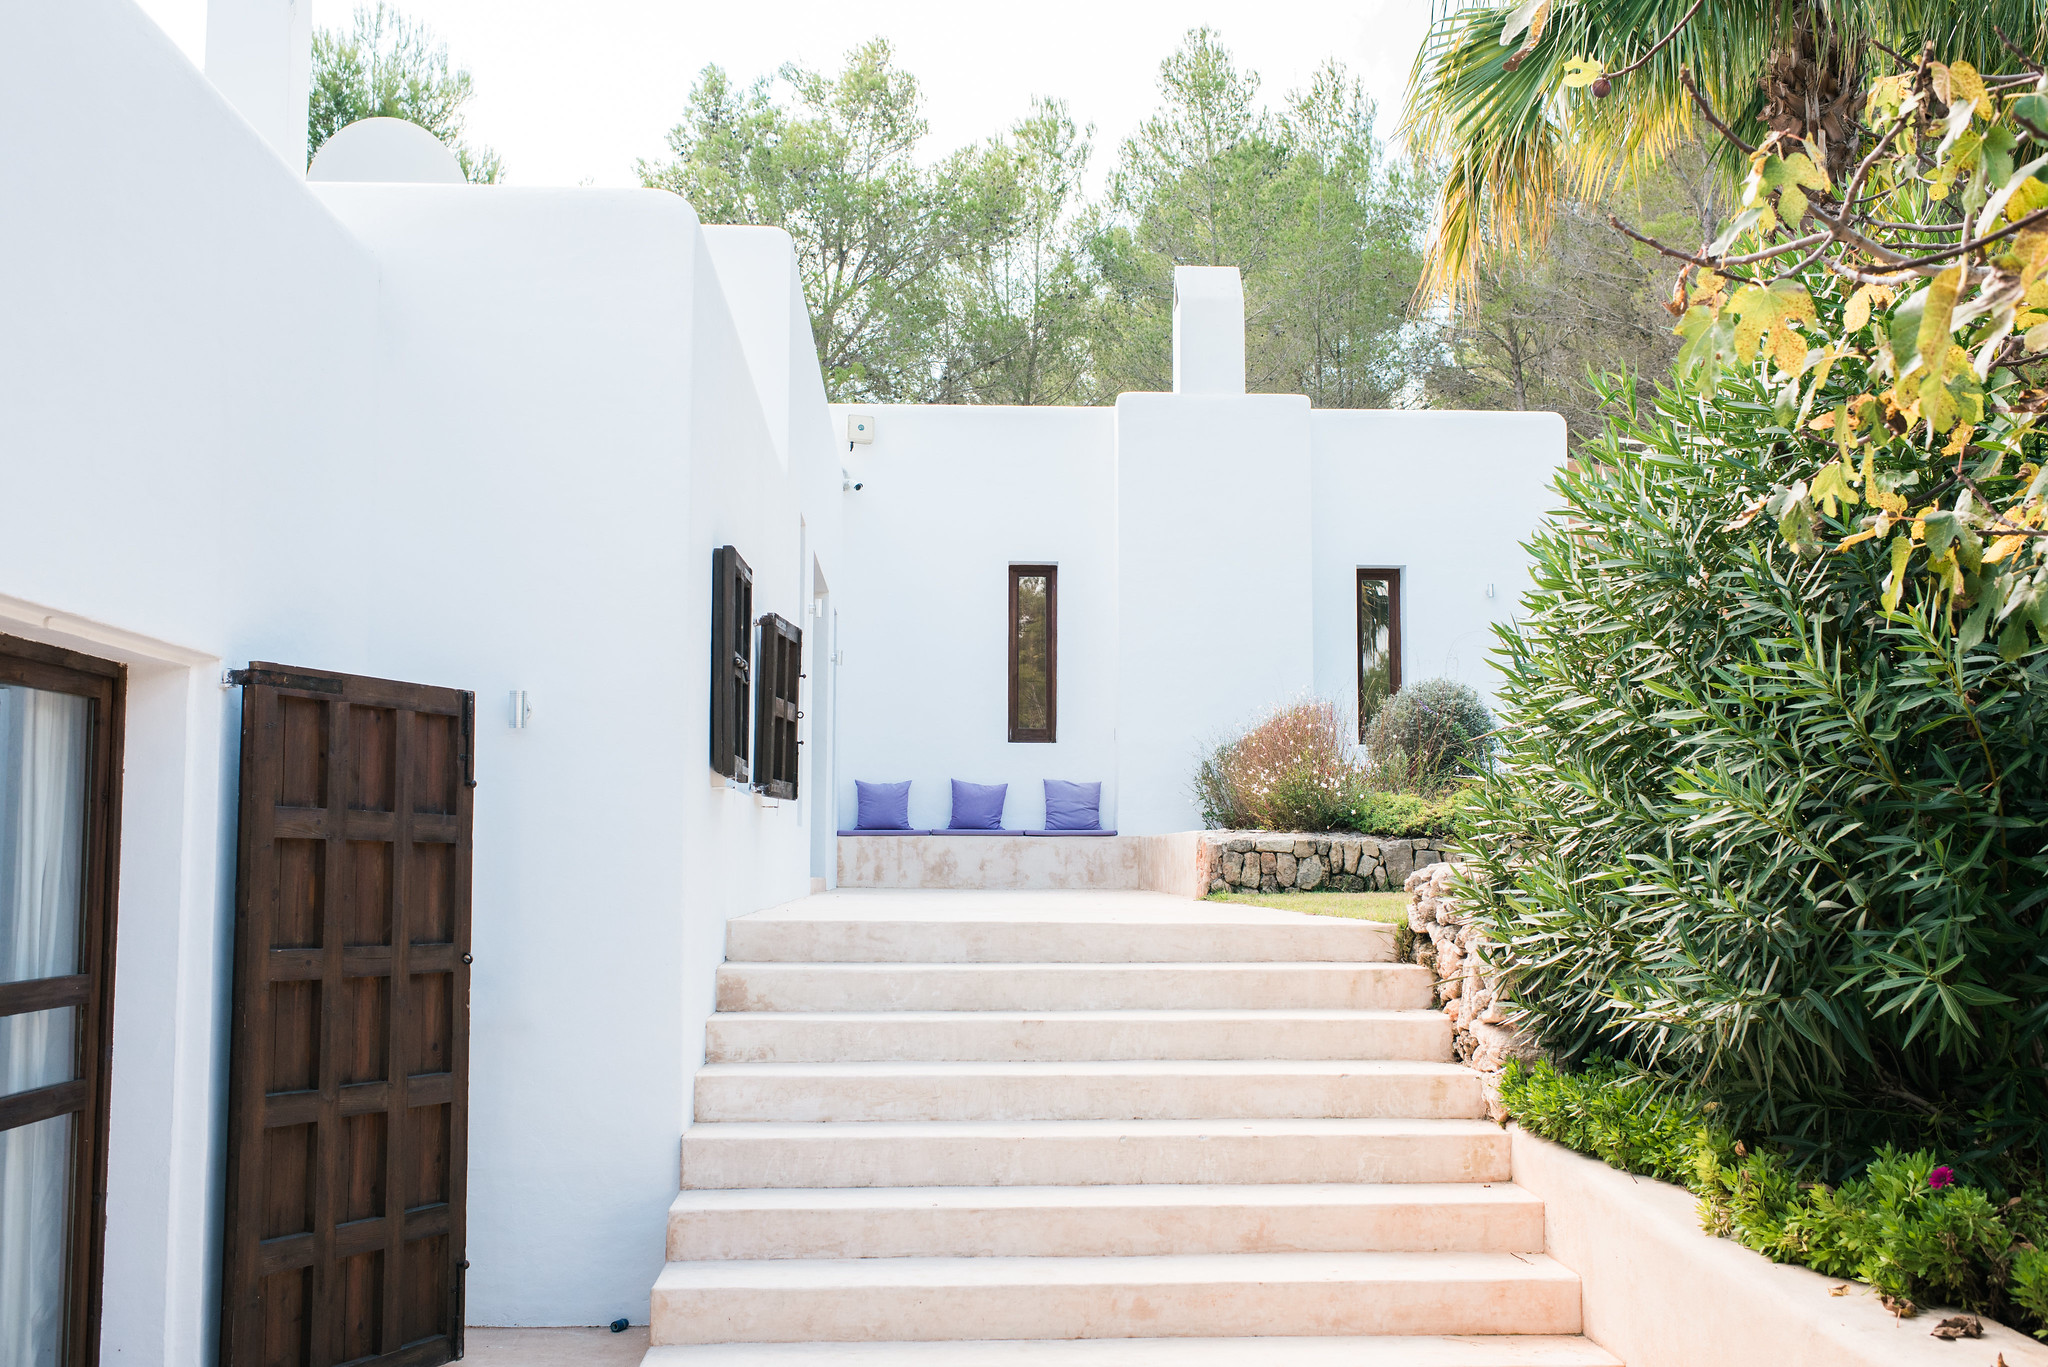 https://www.white-ibiza.com/wp-content/uploads/2020/06/white-ibiza-villas-casa-arabella-exterior-steps.jpg